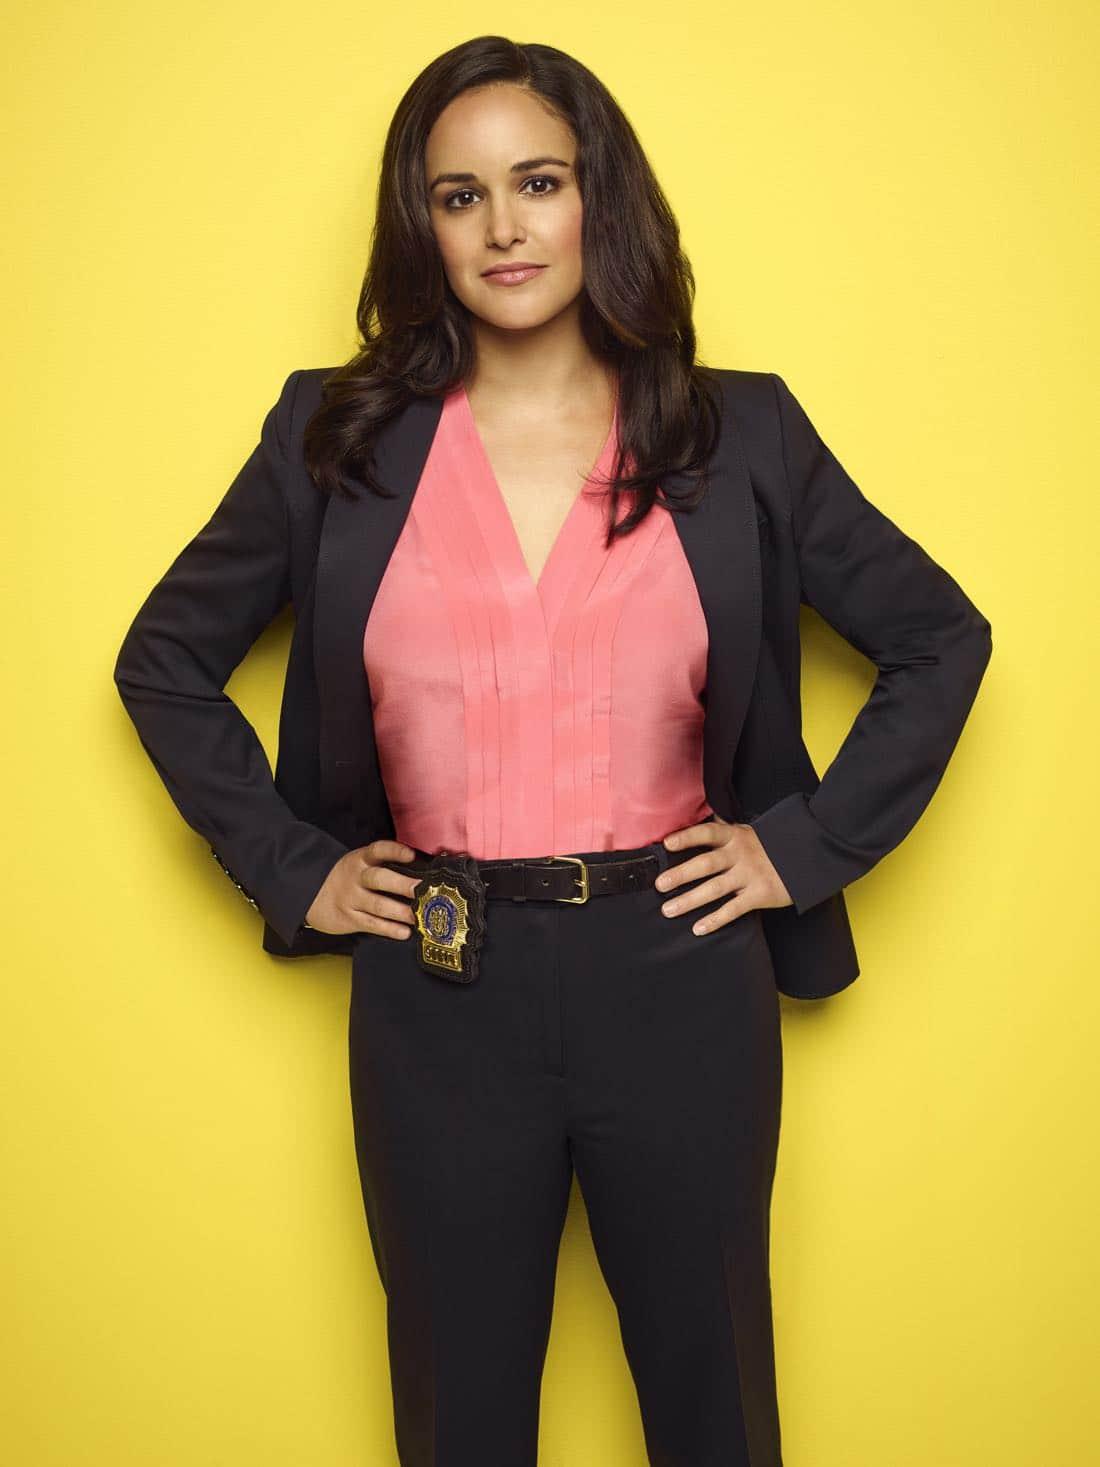 BROOKLYN NINE-NINE: Melissa Fumero as Detective Amy Santiago. BROOKLYN NINE-NINE Season Five premieres Tuesday, Sept. 26 (9:30-10:00 PM ET/PT) on FOX. ©2017 Fox Broadcasting Co. CR: Robert Trachtenberg/FOX